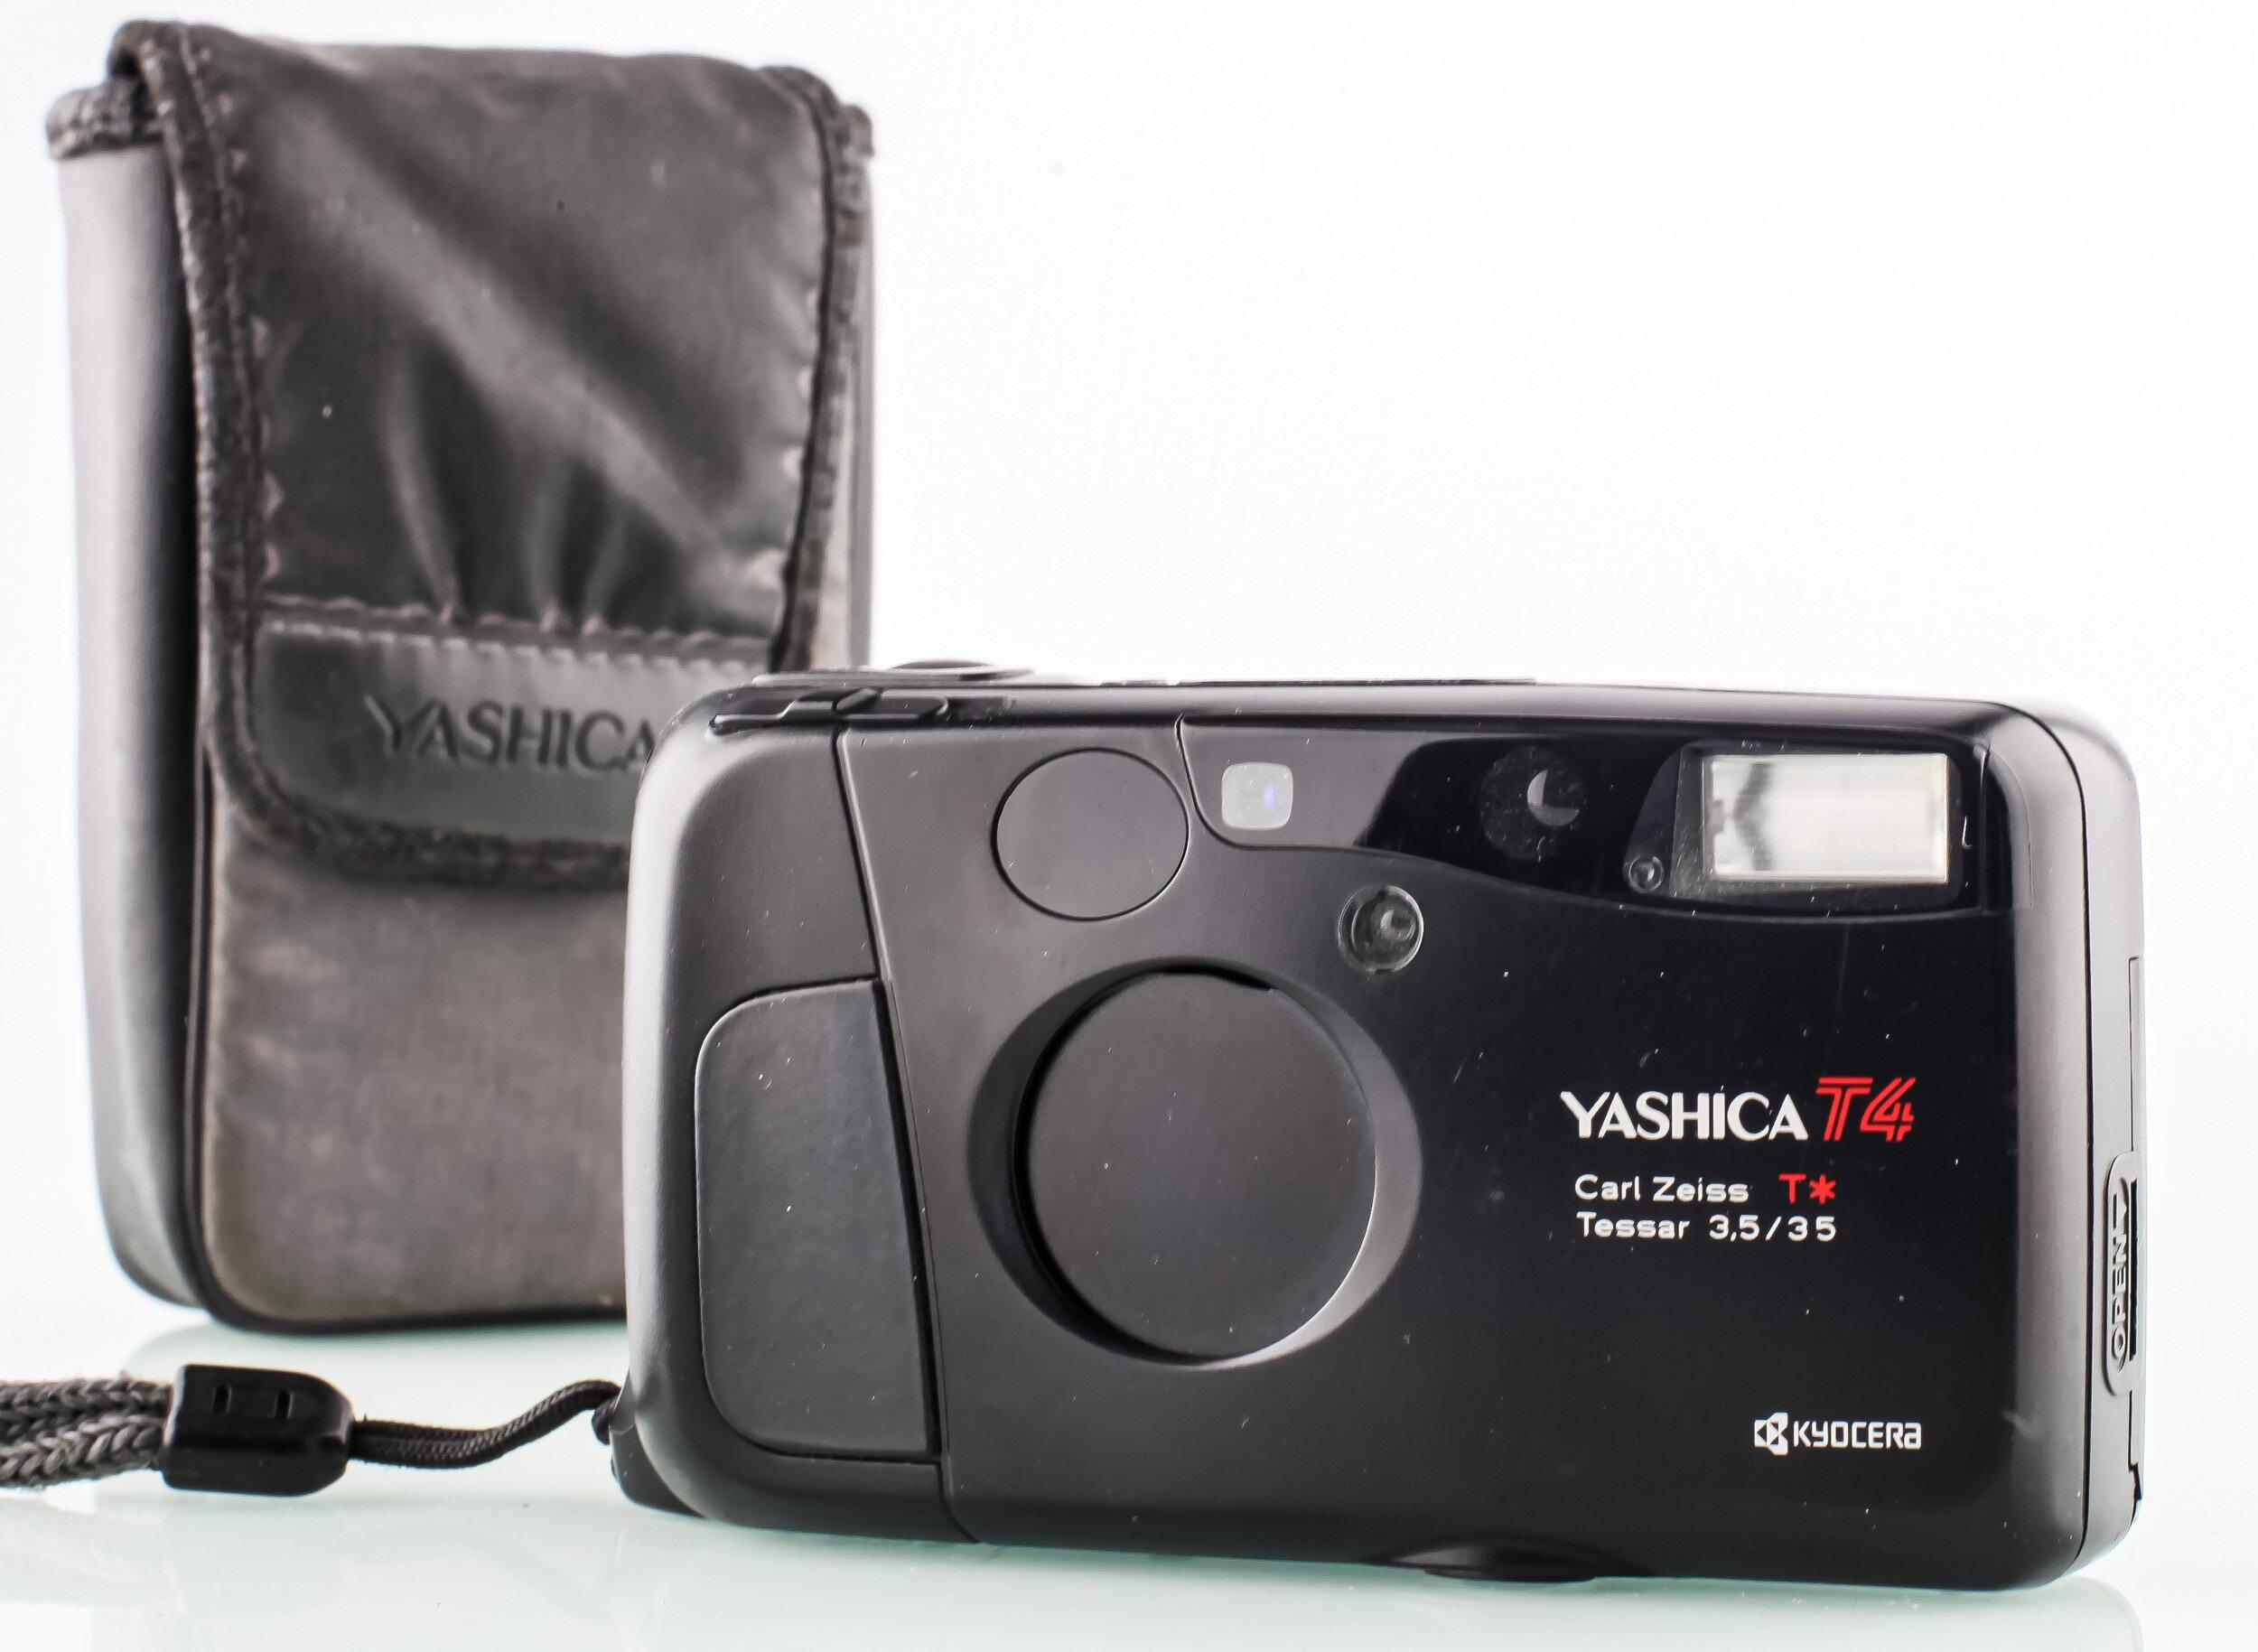 Yashica T4 Carl Zeiss T* Tessear 3,5/35mm